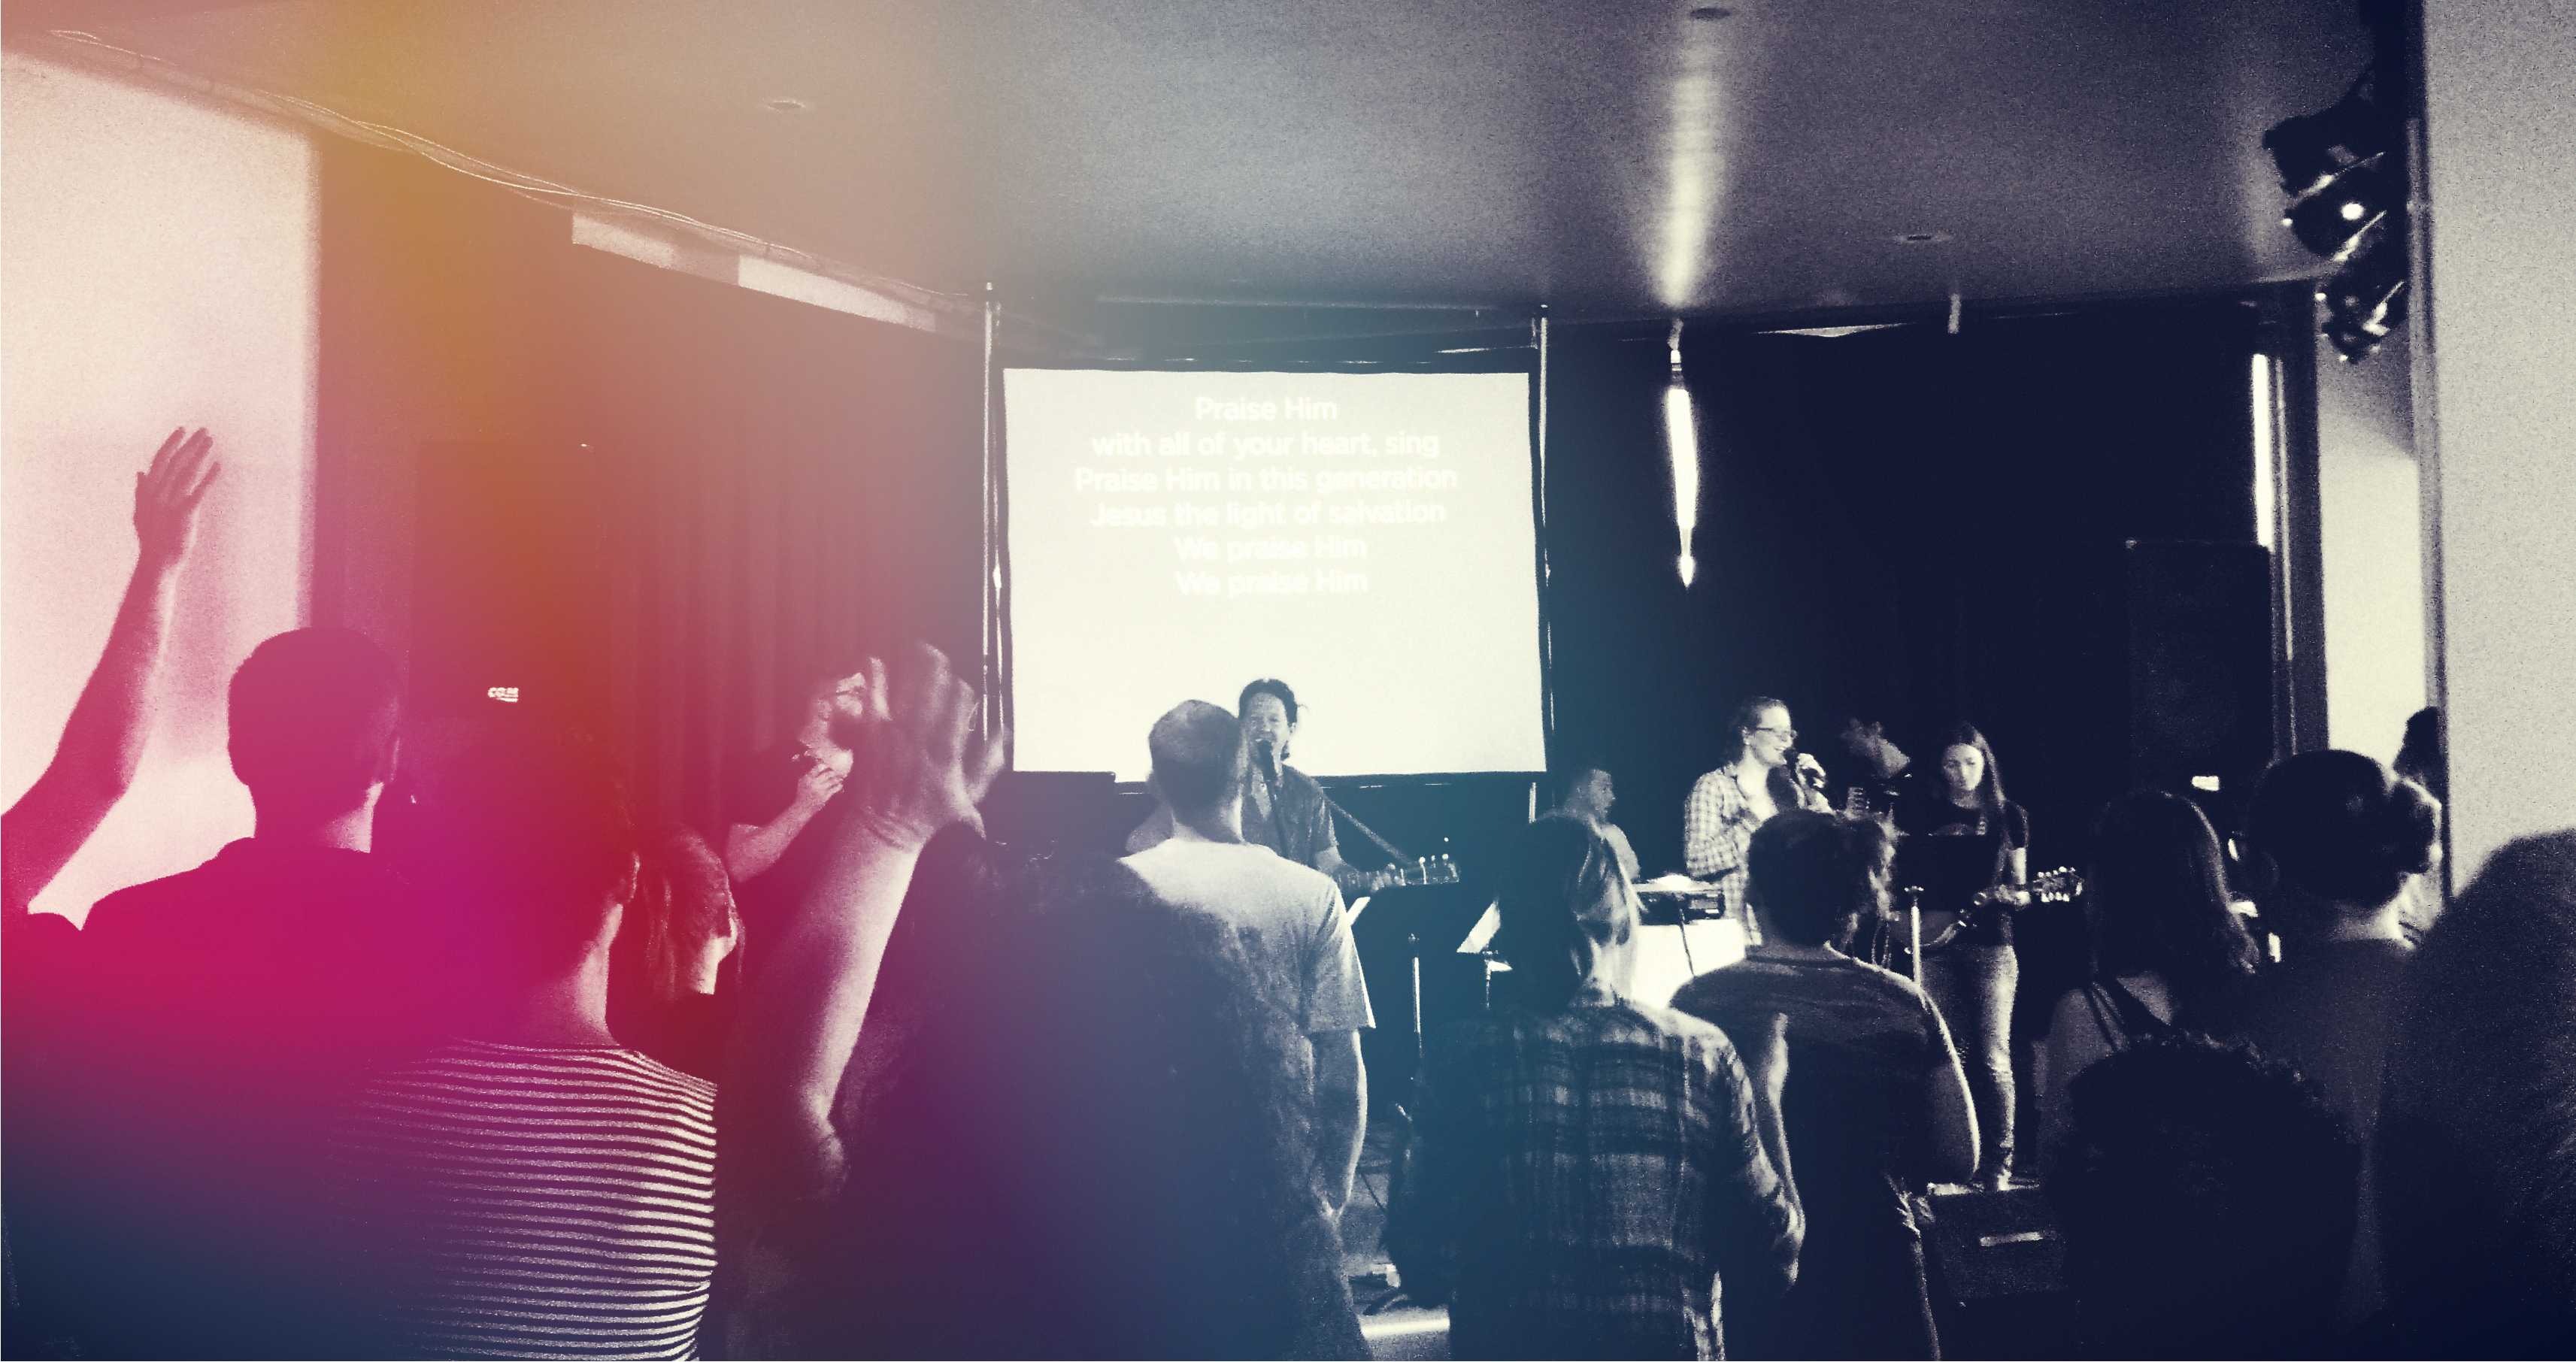 Why Do We Worship Through Music?